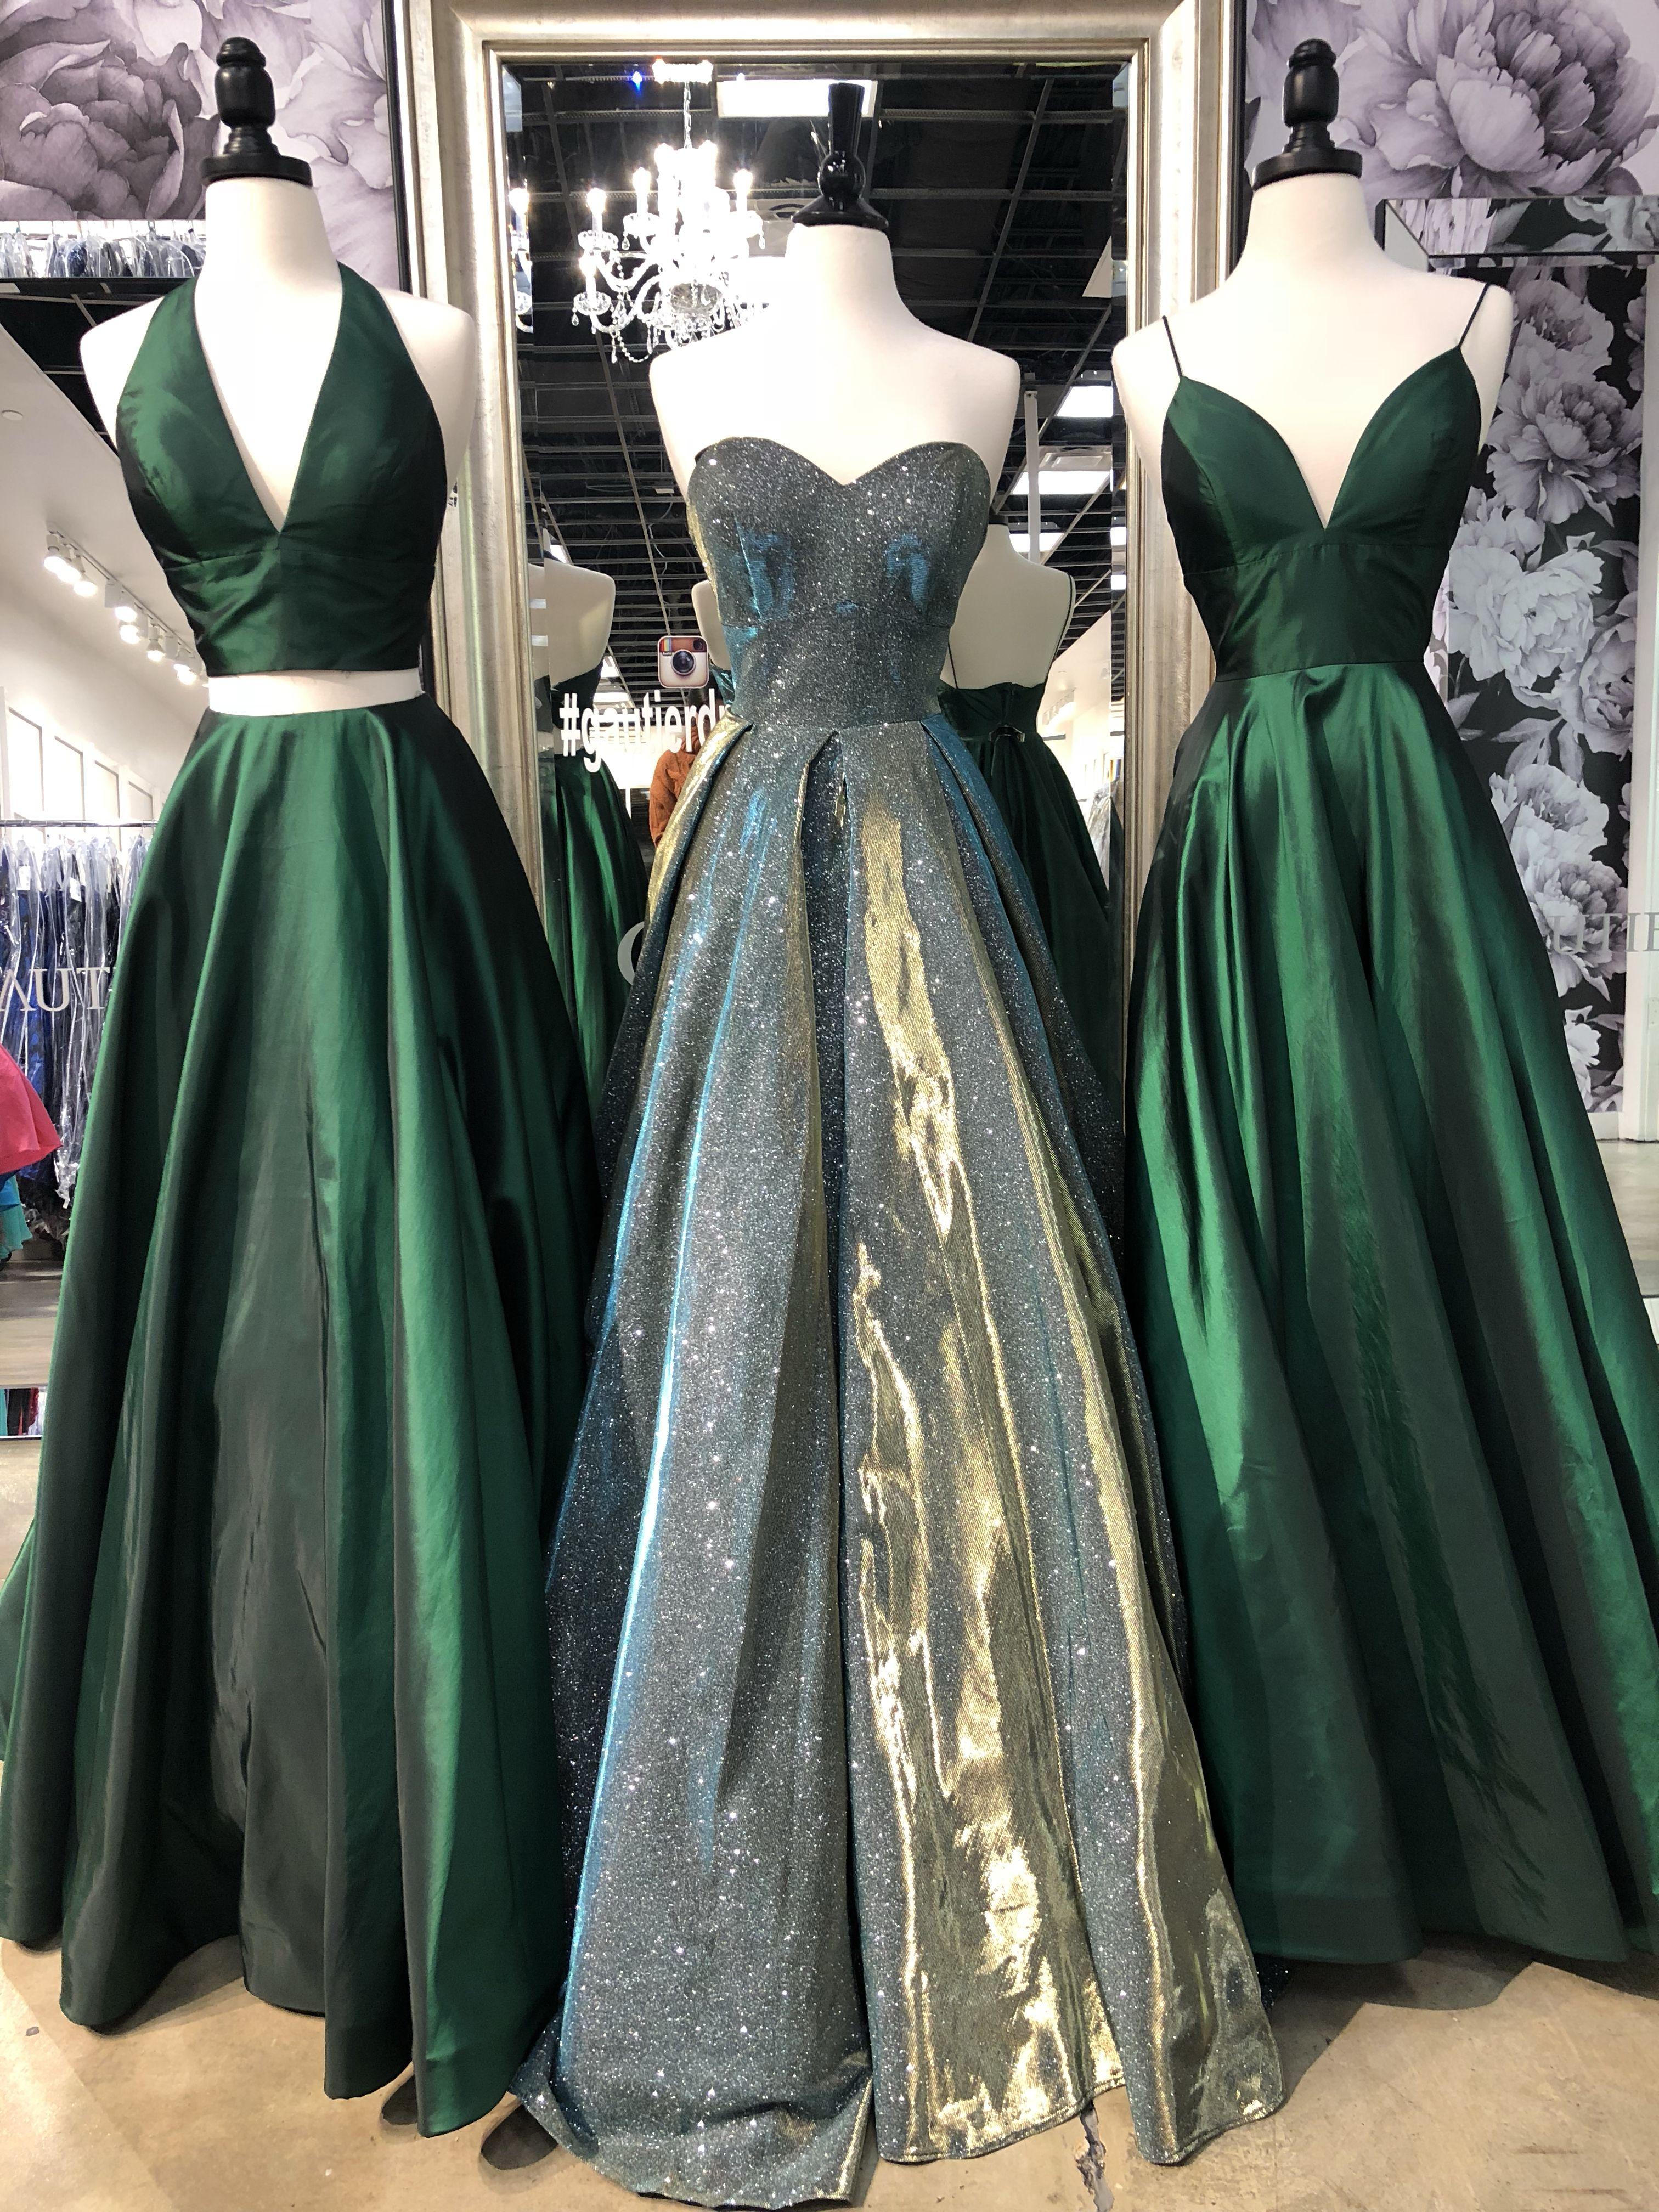 Emerald Green Prom Dress Emerald Green Prom Dress Green Prom Dress Prom Dresses [ 4032 x 3024 Pixel ]